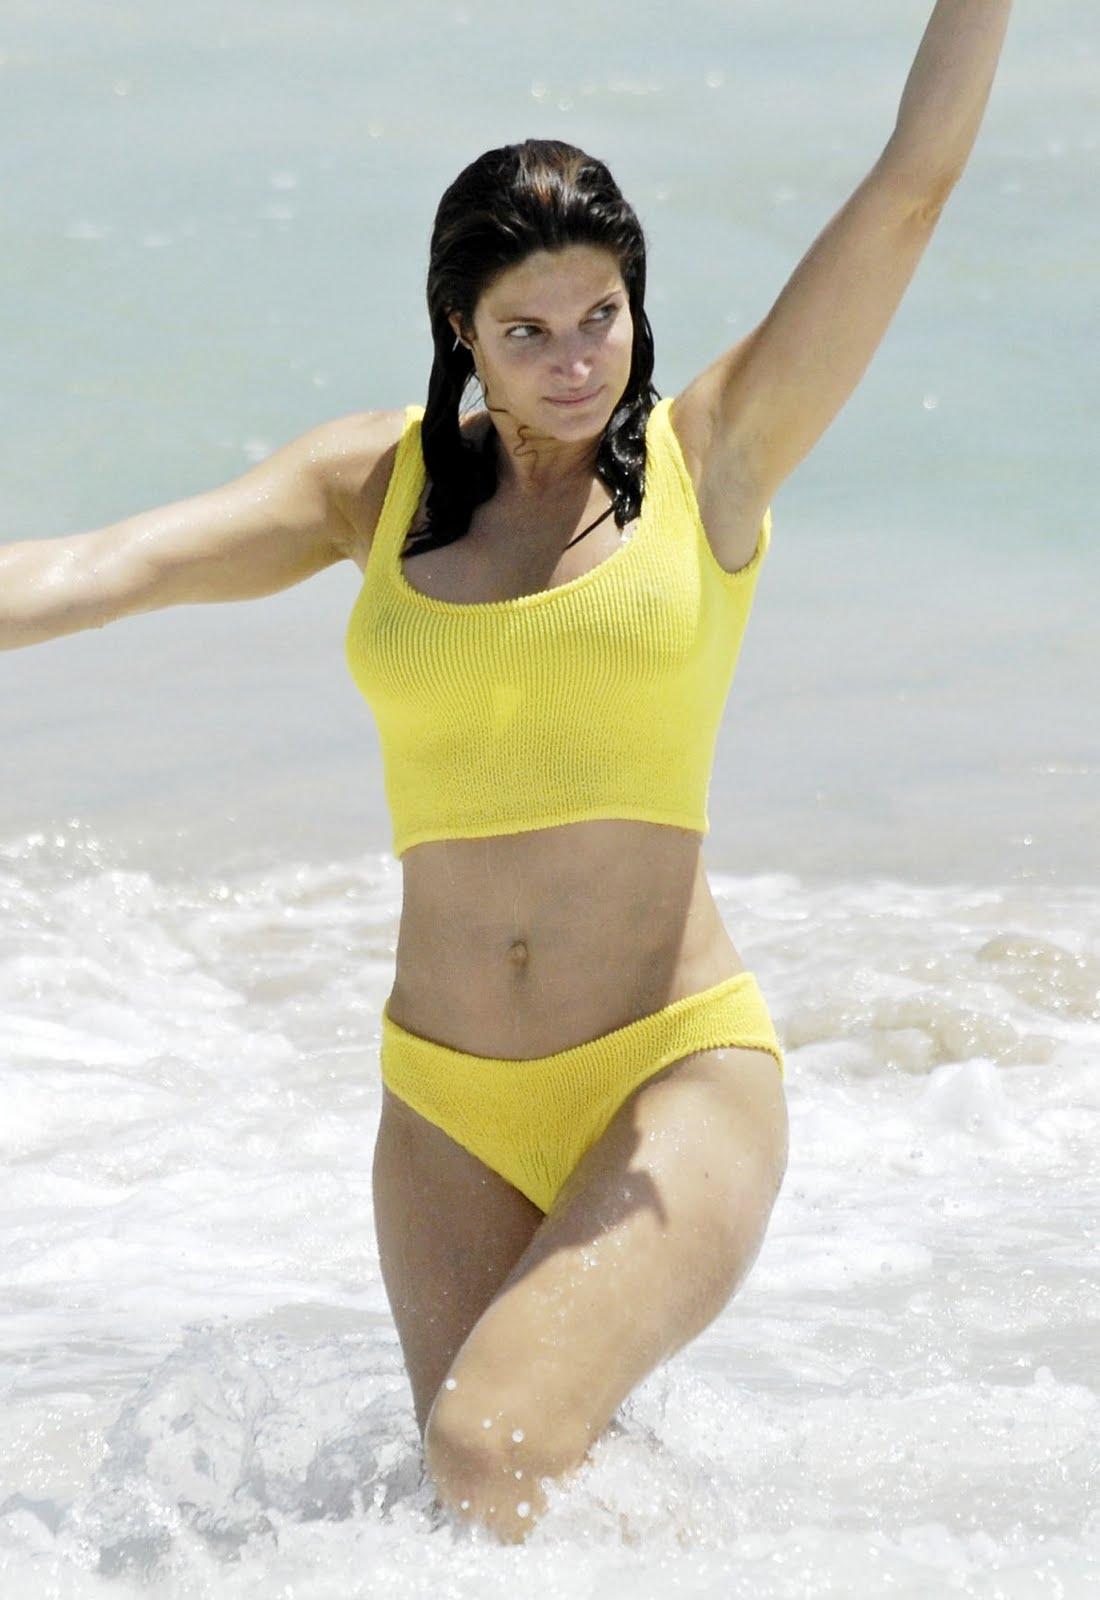 http://4.bp.blogspot.com/-dYidjZ2v1GI/TdvcPTyH-5I/AAAAAAAACKE/taSIEgCjMjw/s1600/Stephanie+Seymour+in+Bikini+9.jpg